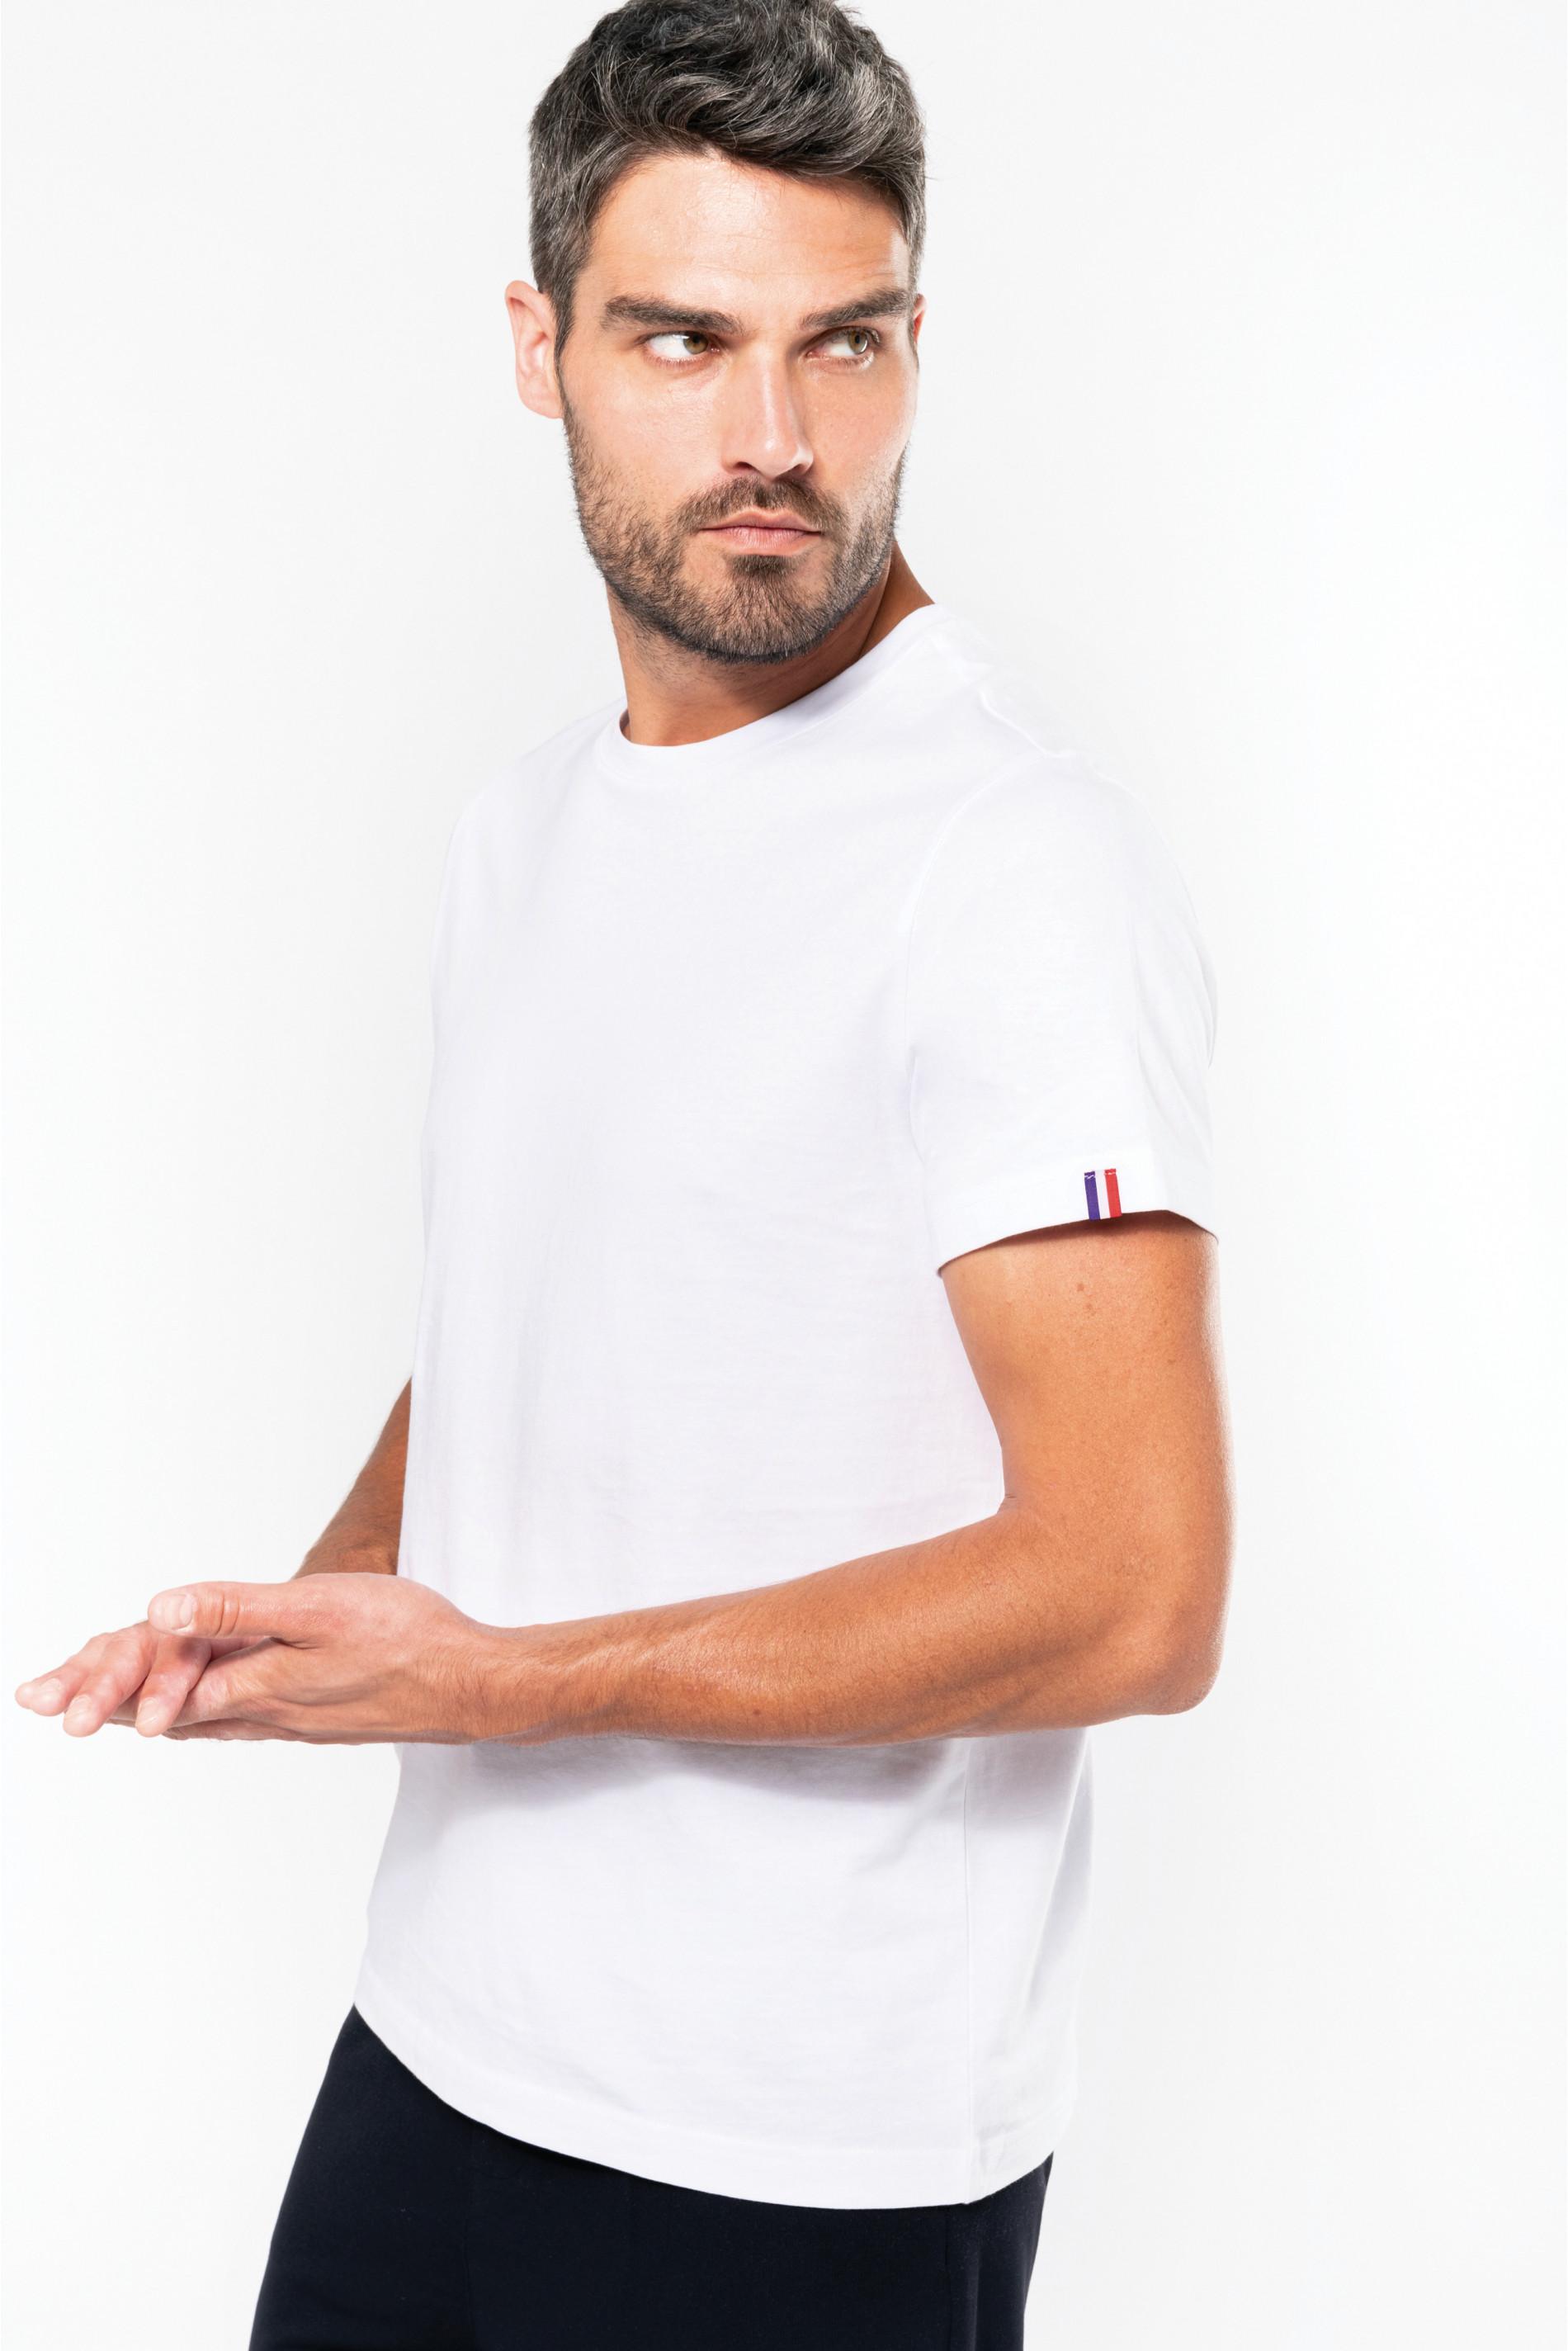 T-shirt fabrication française